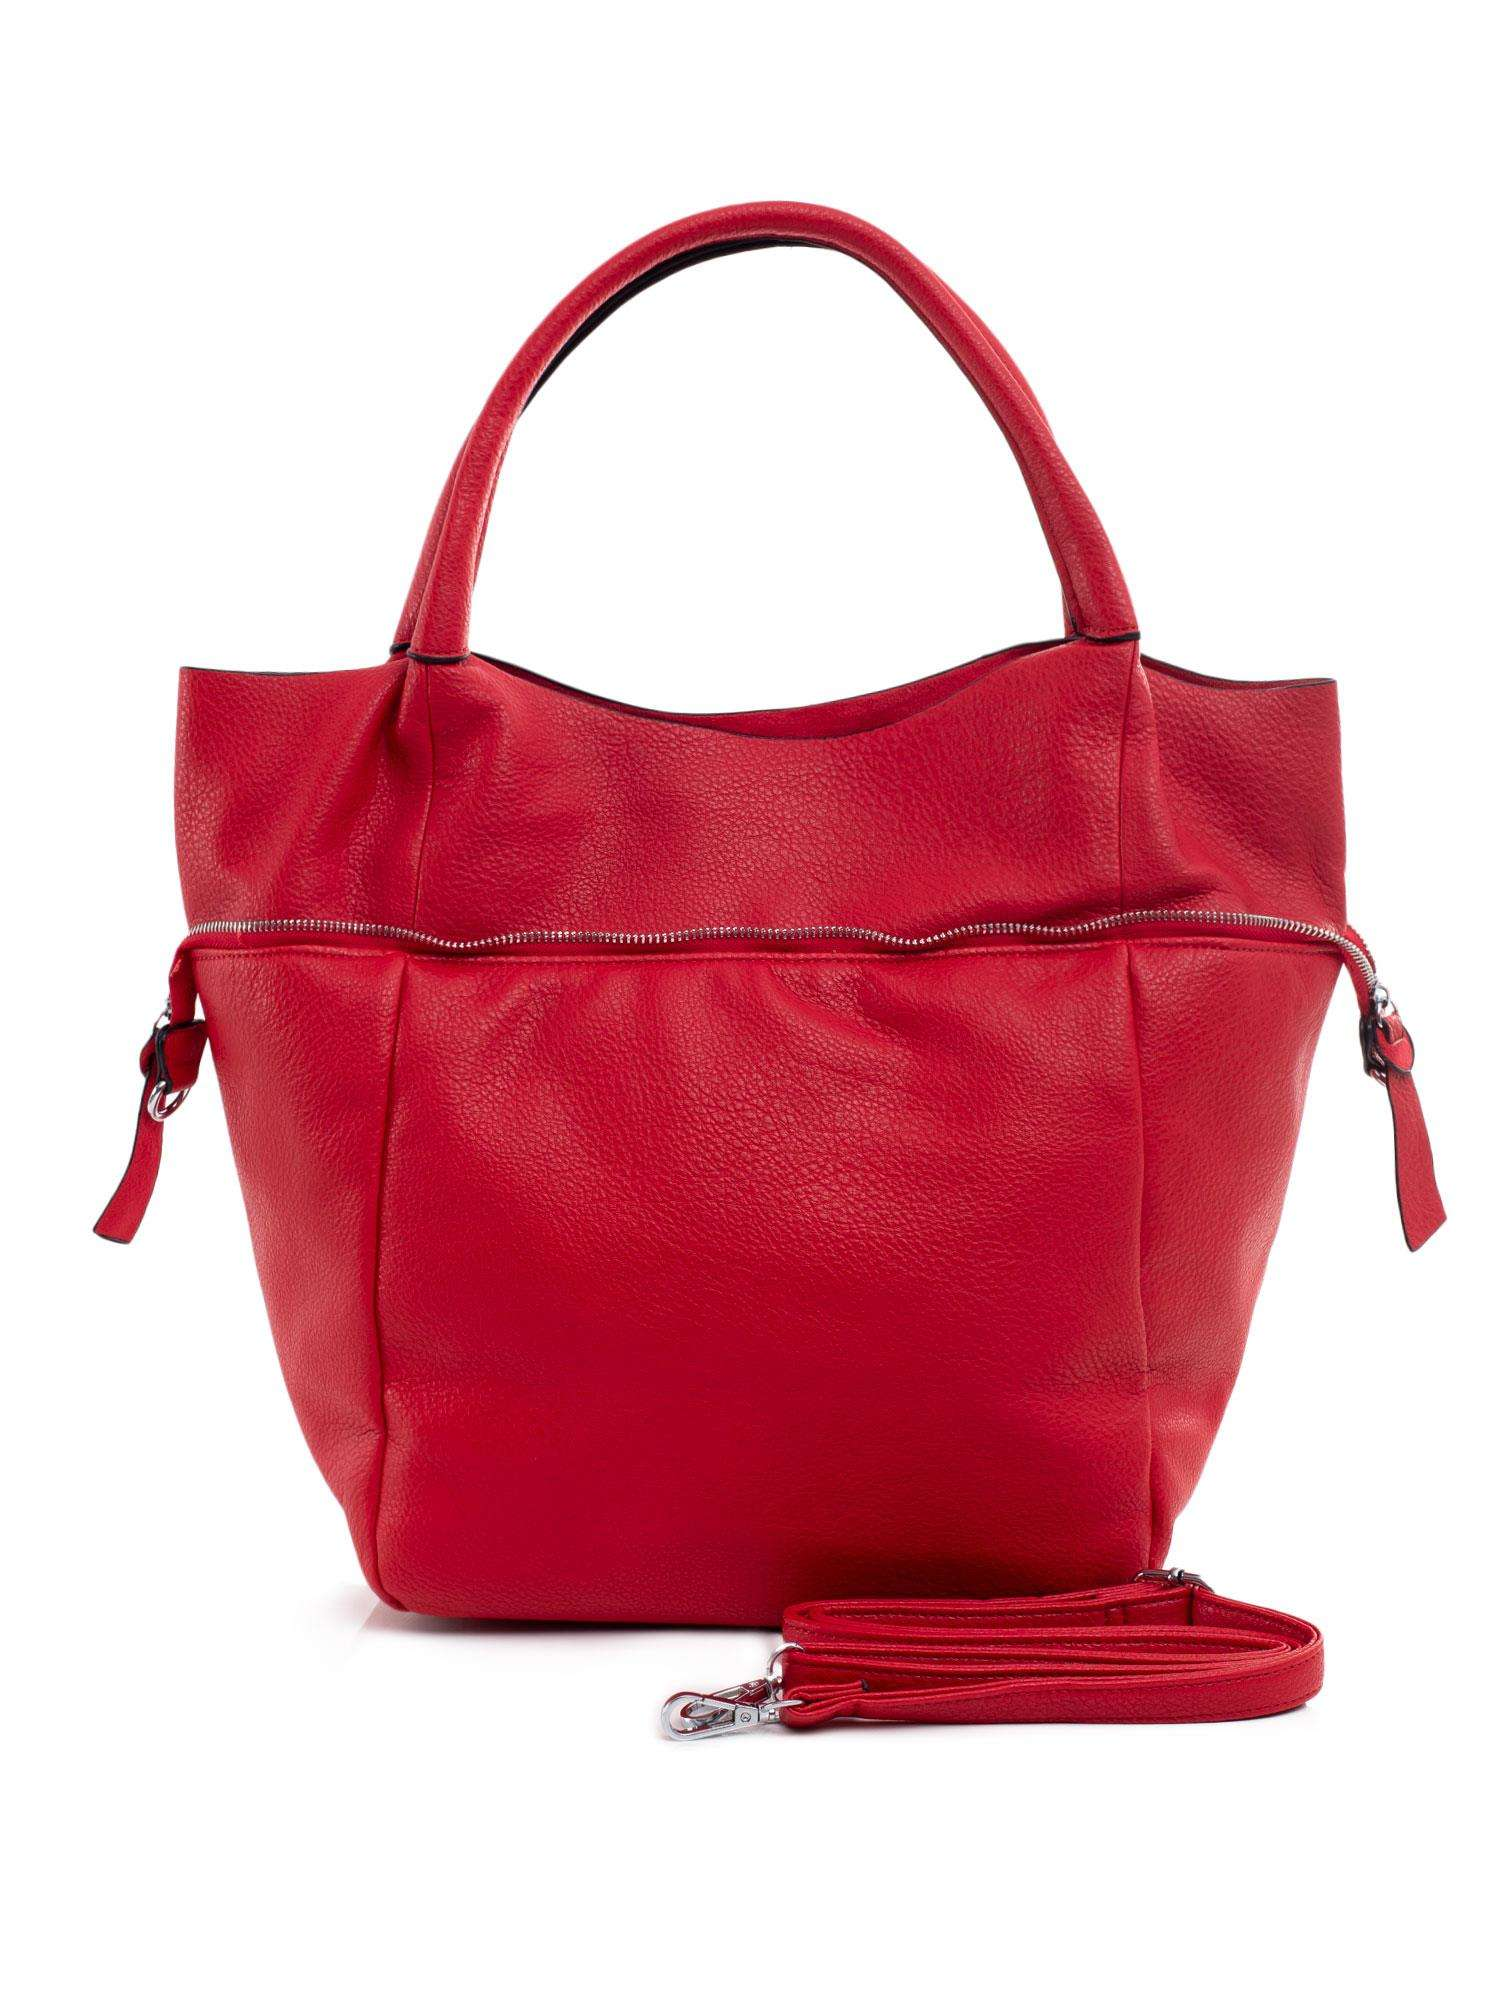 Dámska veľká červená taška ONE SIZE